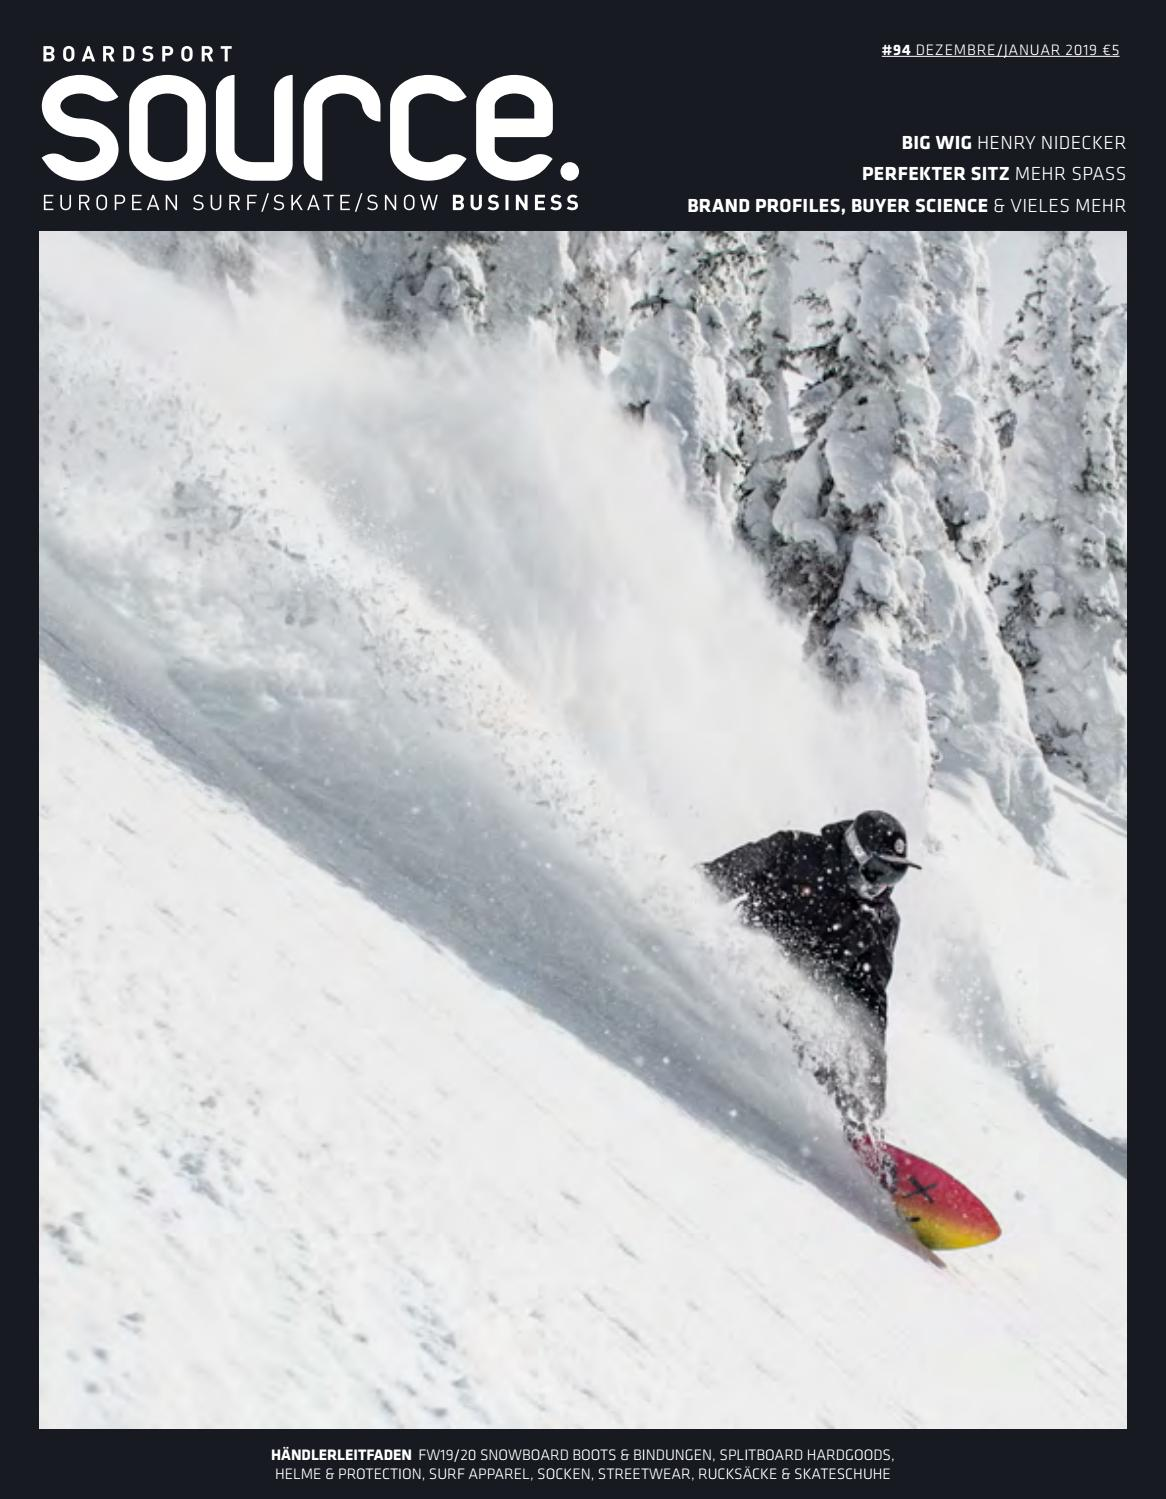 Pack Snowboard JONES. MOUNTAIN TWIN + Salomon Sb Binding